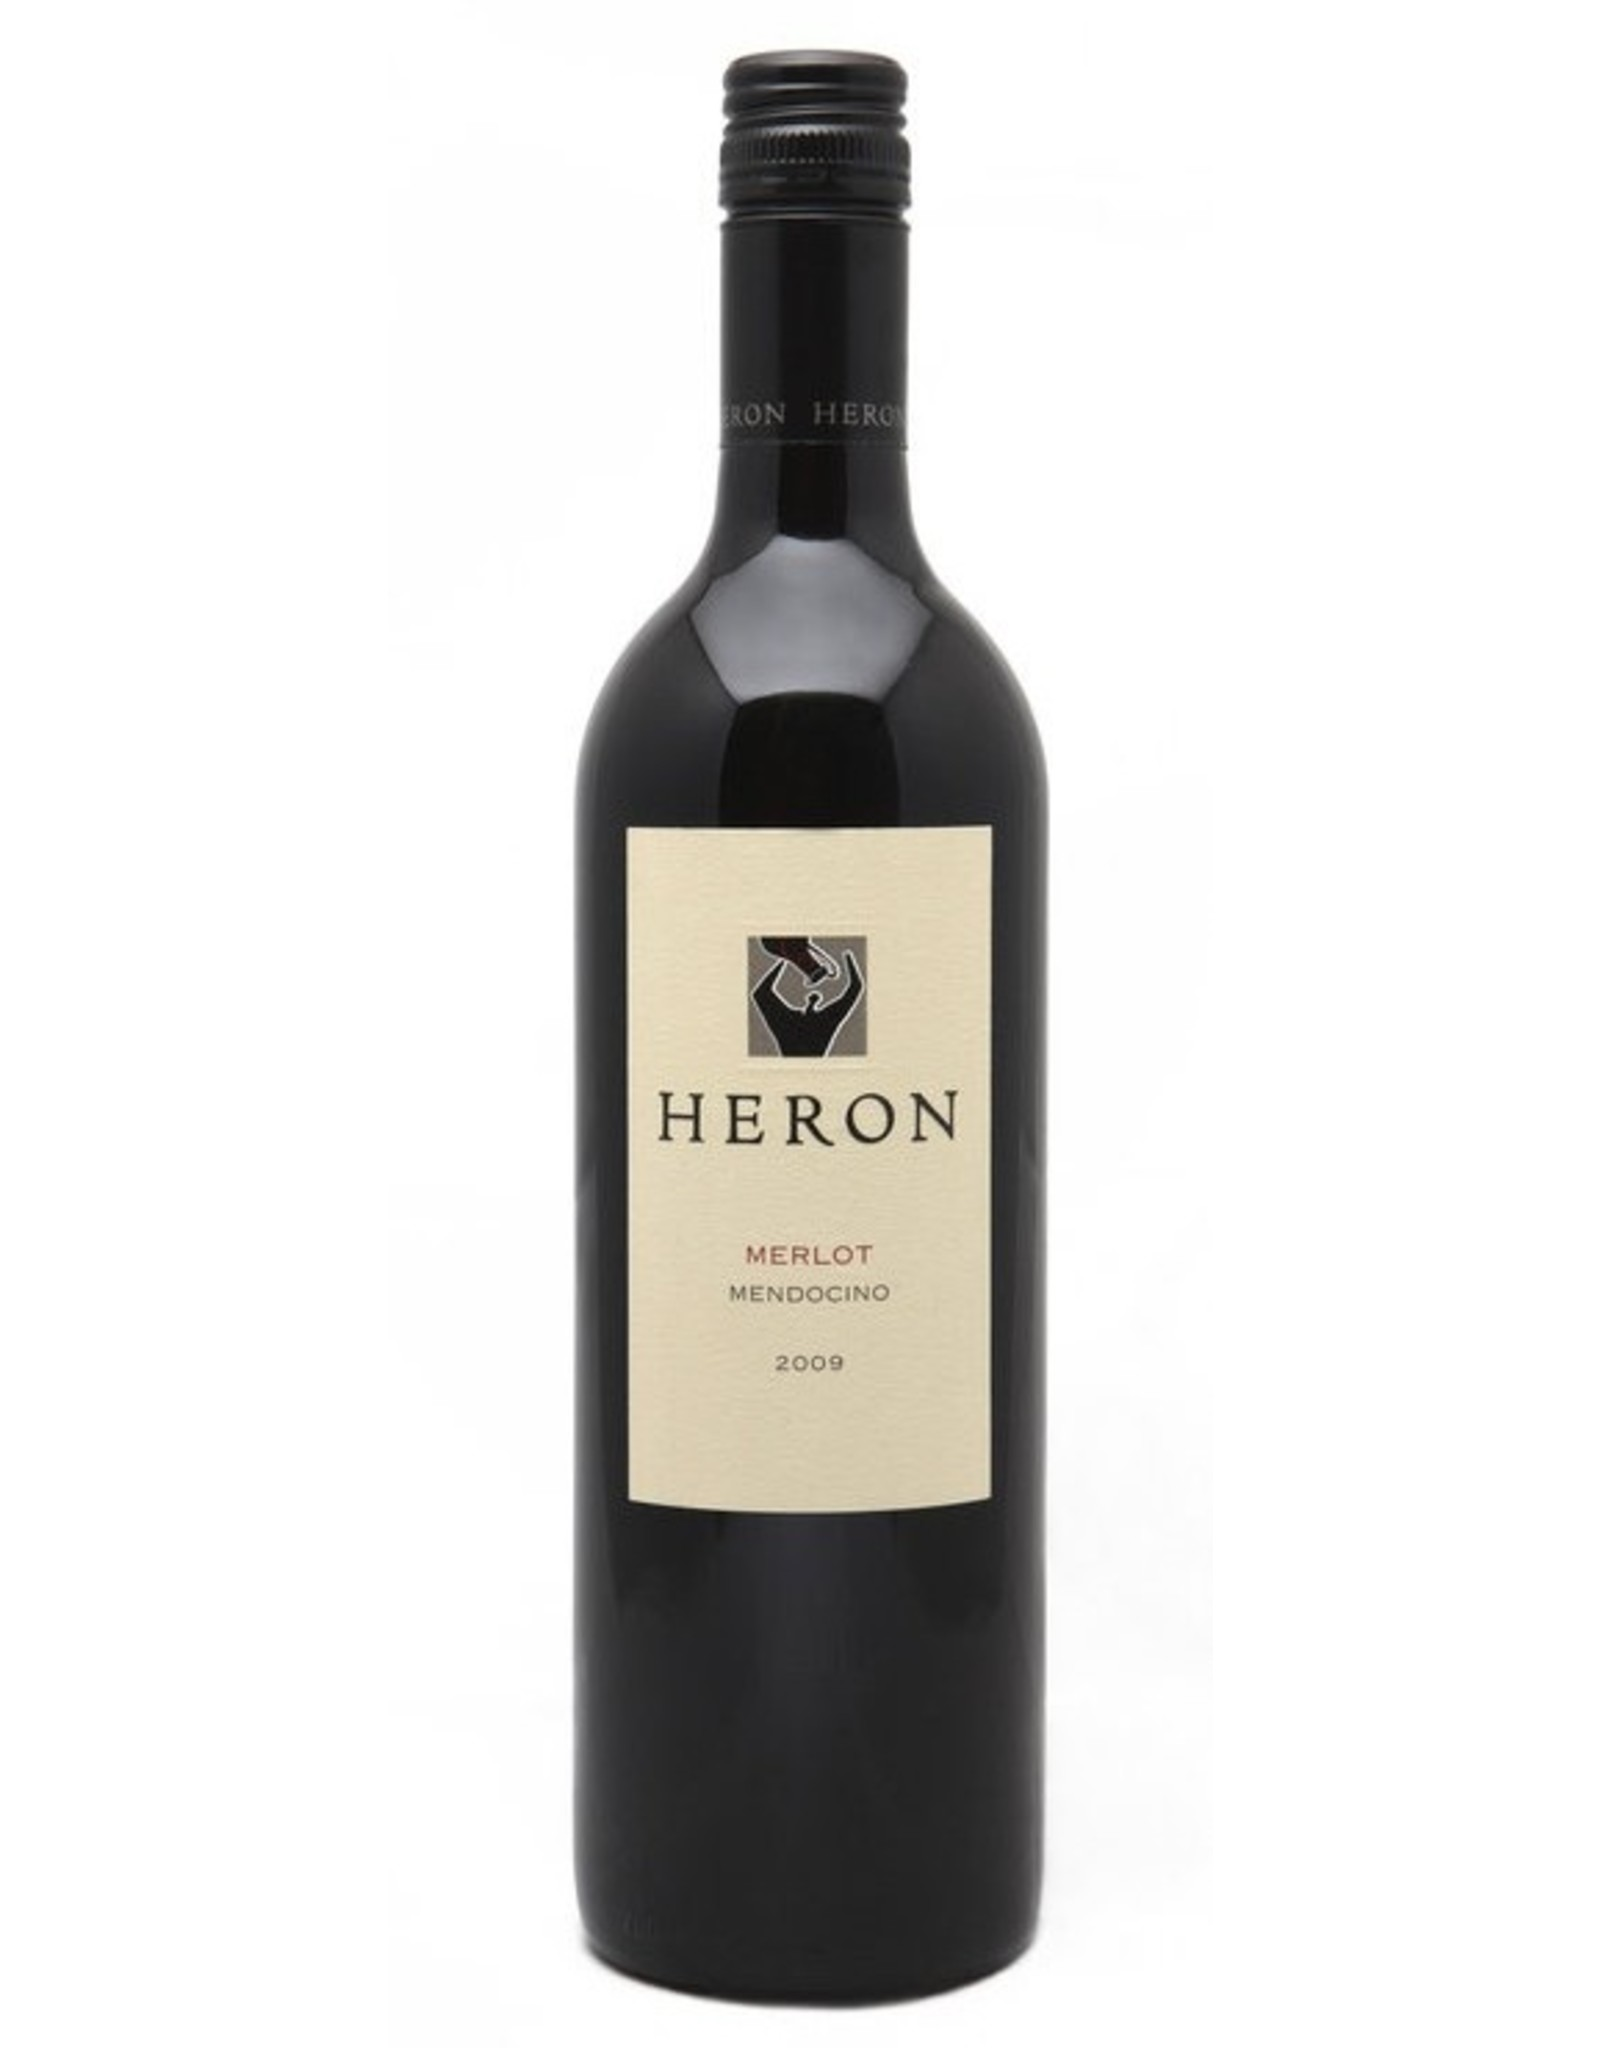 Heron Merlot